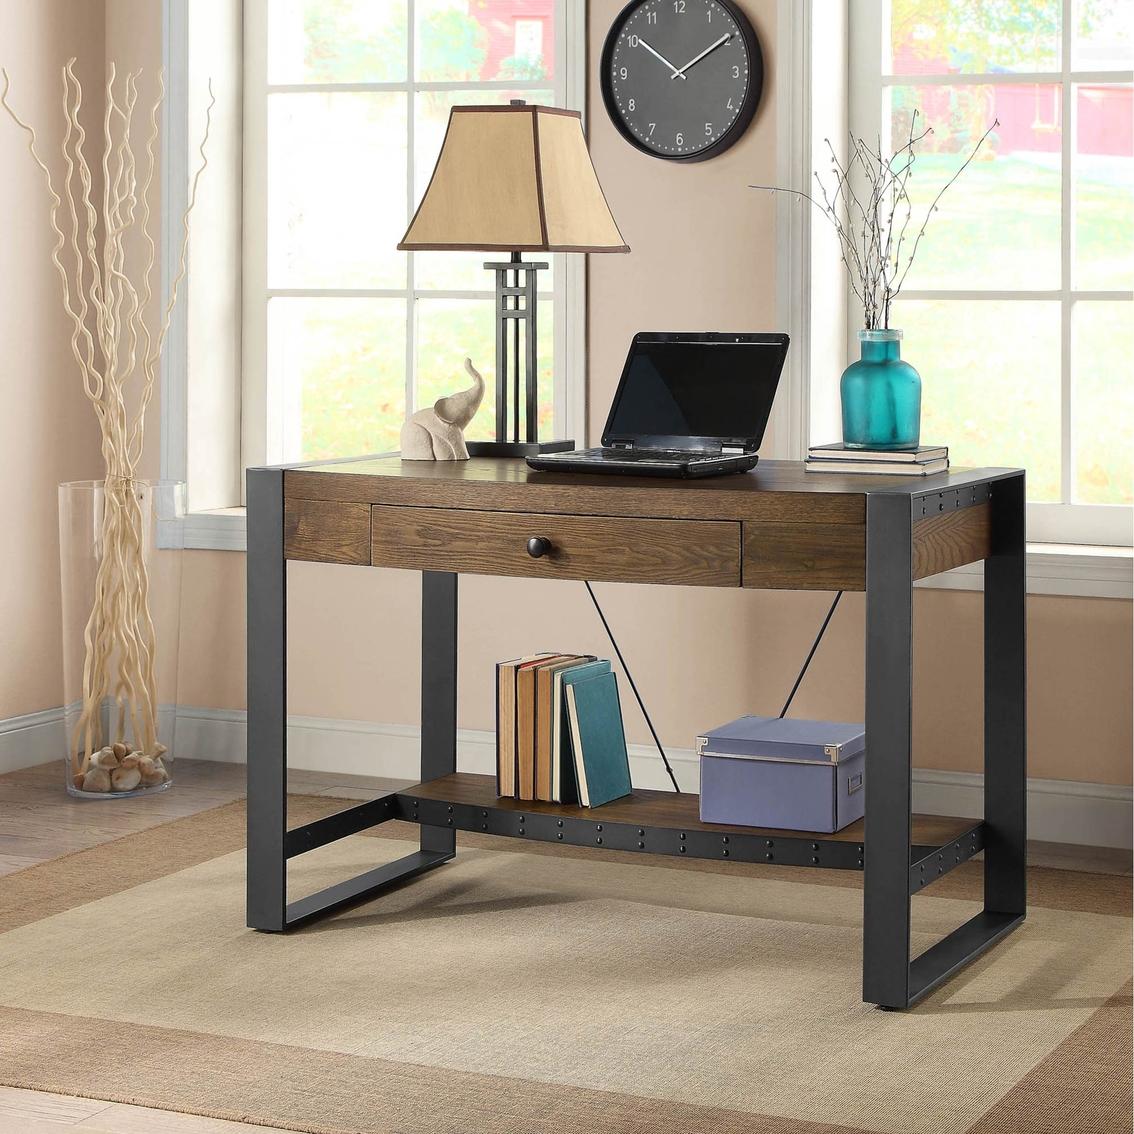 Whalen Desks: Whalen Newcastle Writing Desk